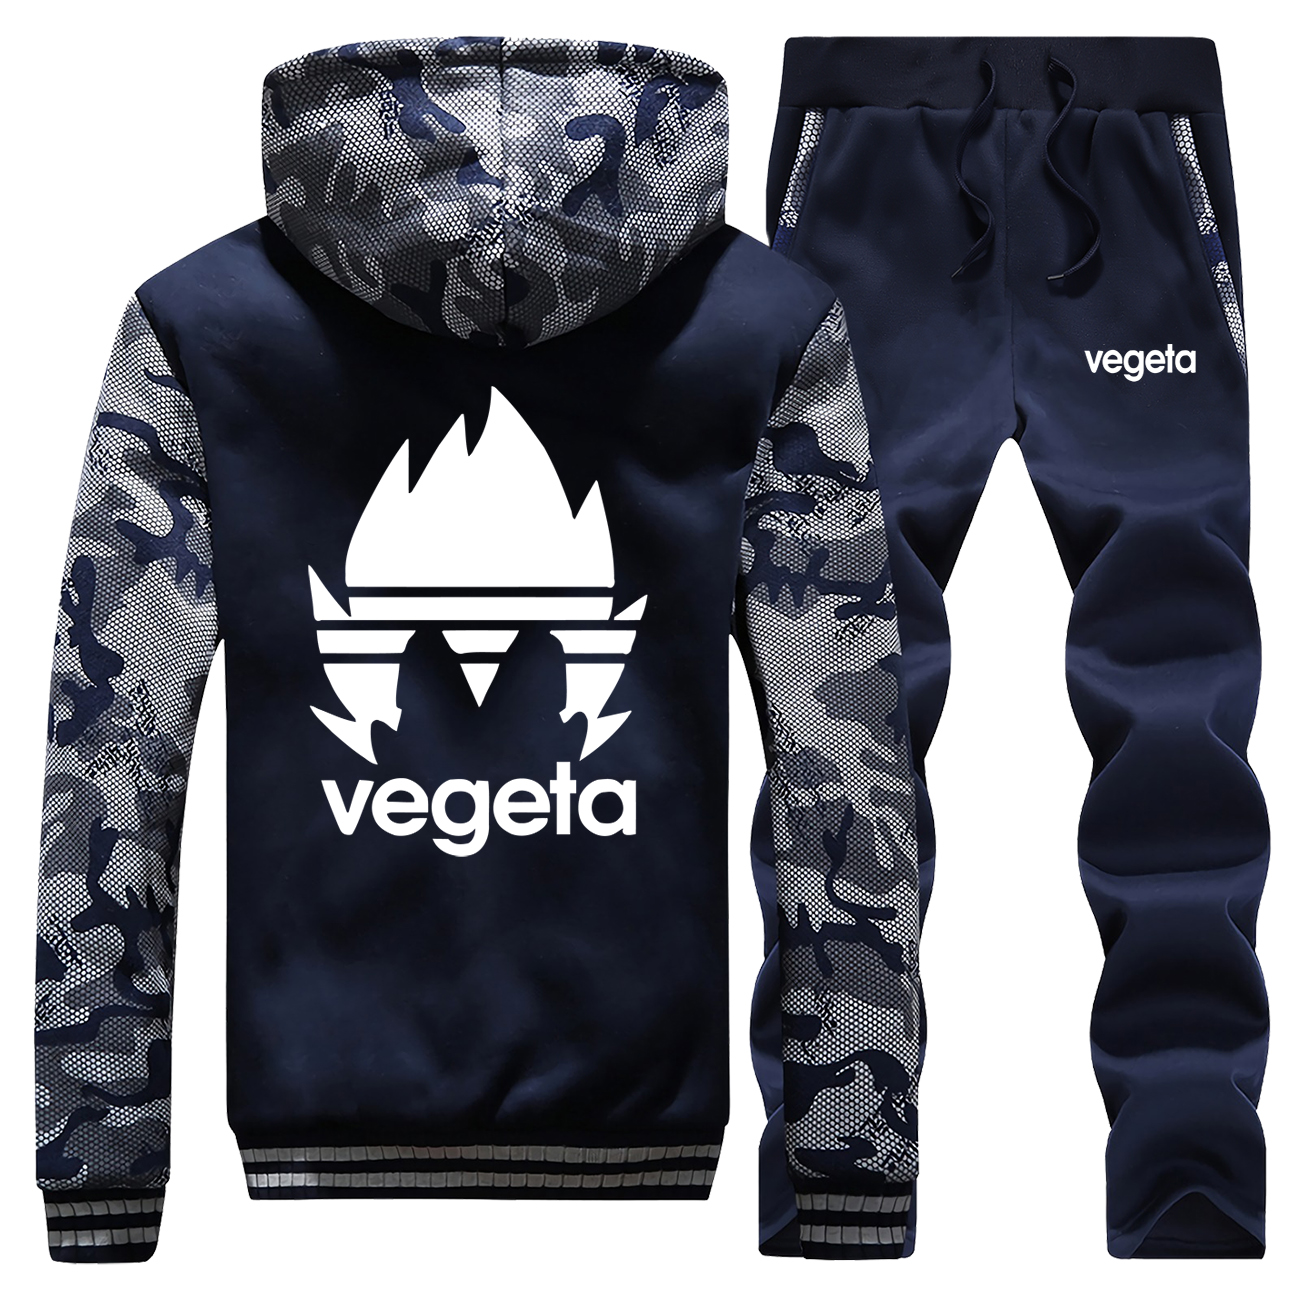 New Arrival Camo Jackets Japan Anime Dragon Ball Men's Sets Begeta Hoodies 2019 Winter Warm Pants Sweatshirt Harajuku Mens Set